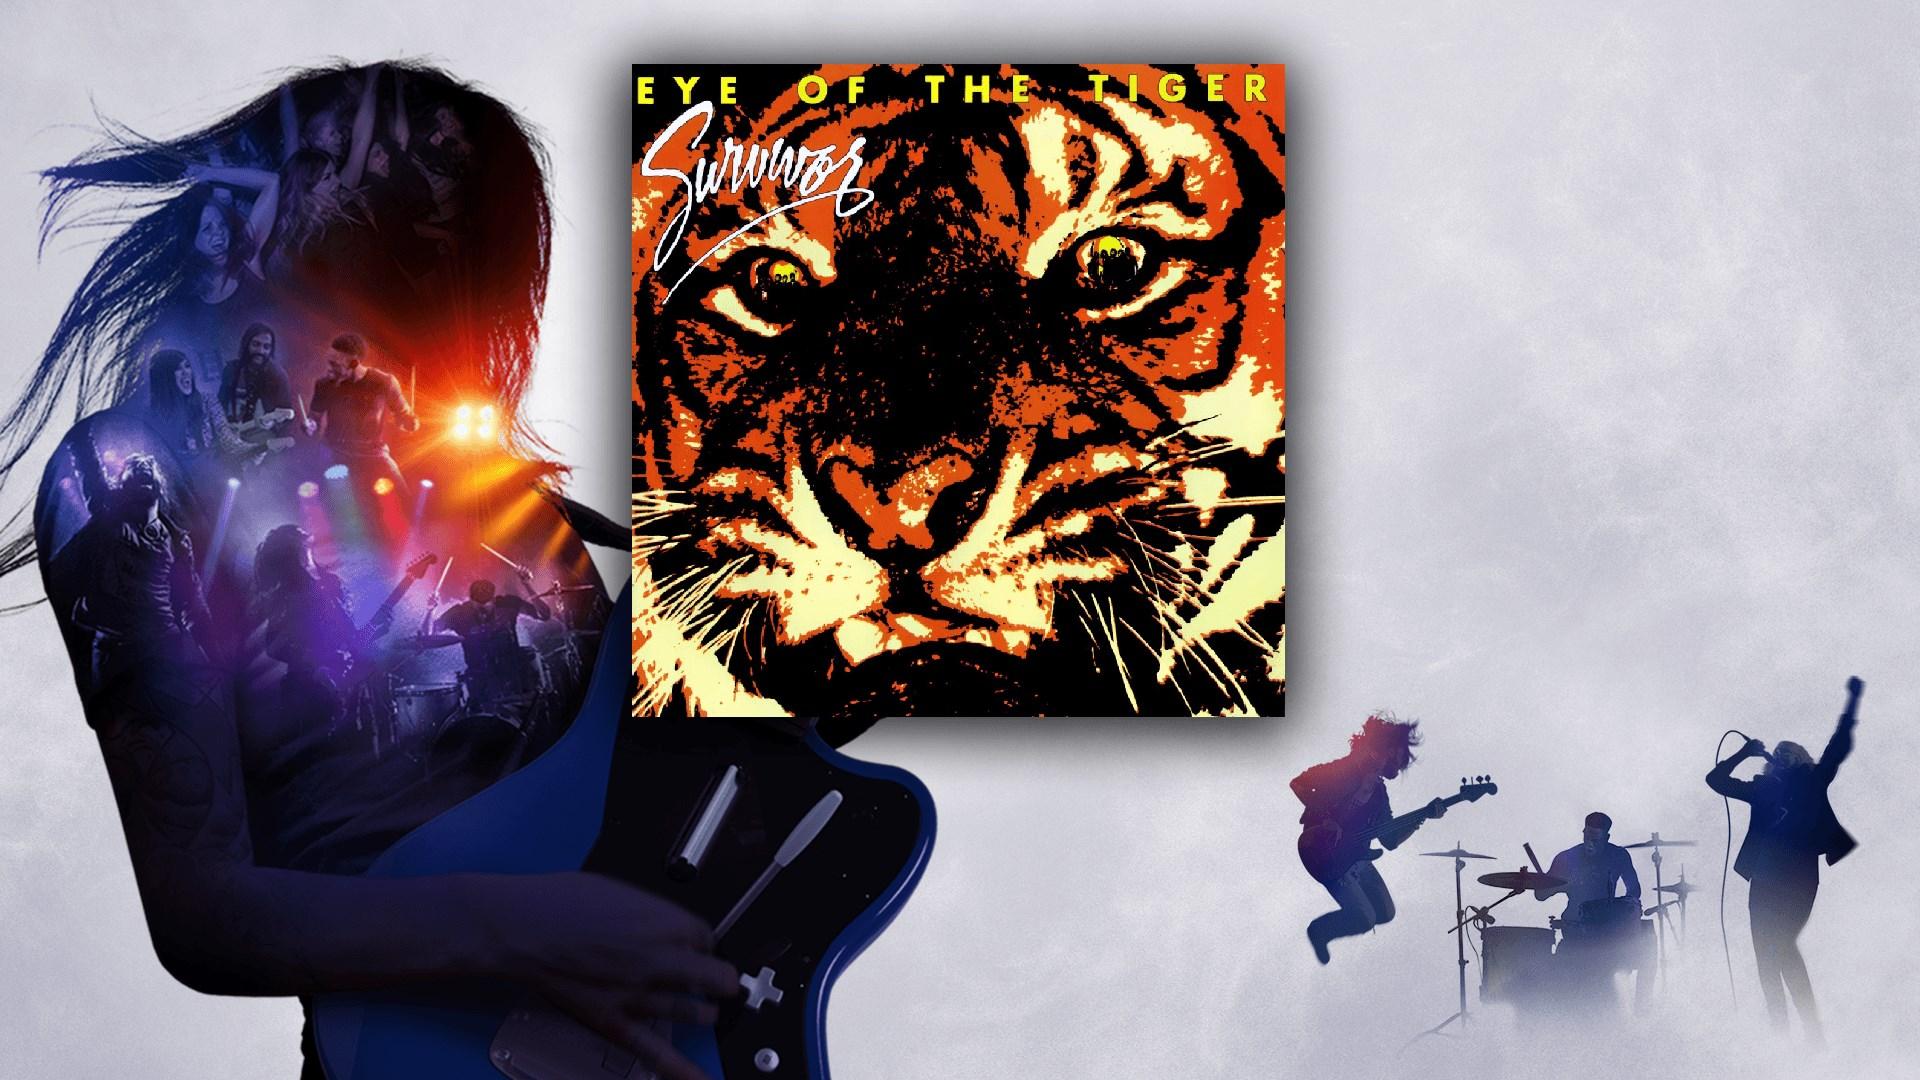 """Eye of the Tiger"" - Survivor"